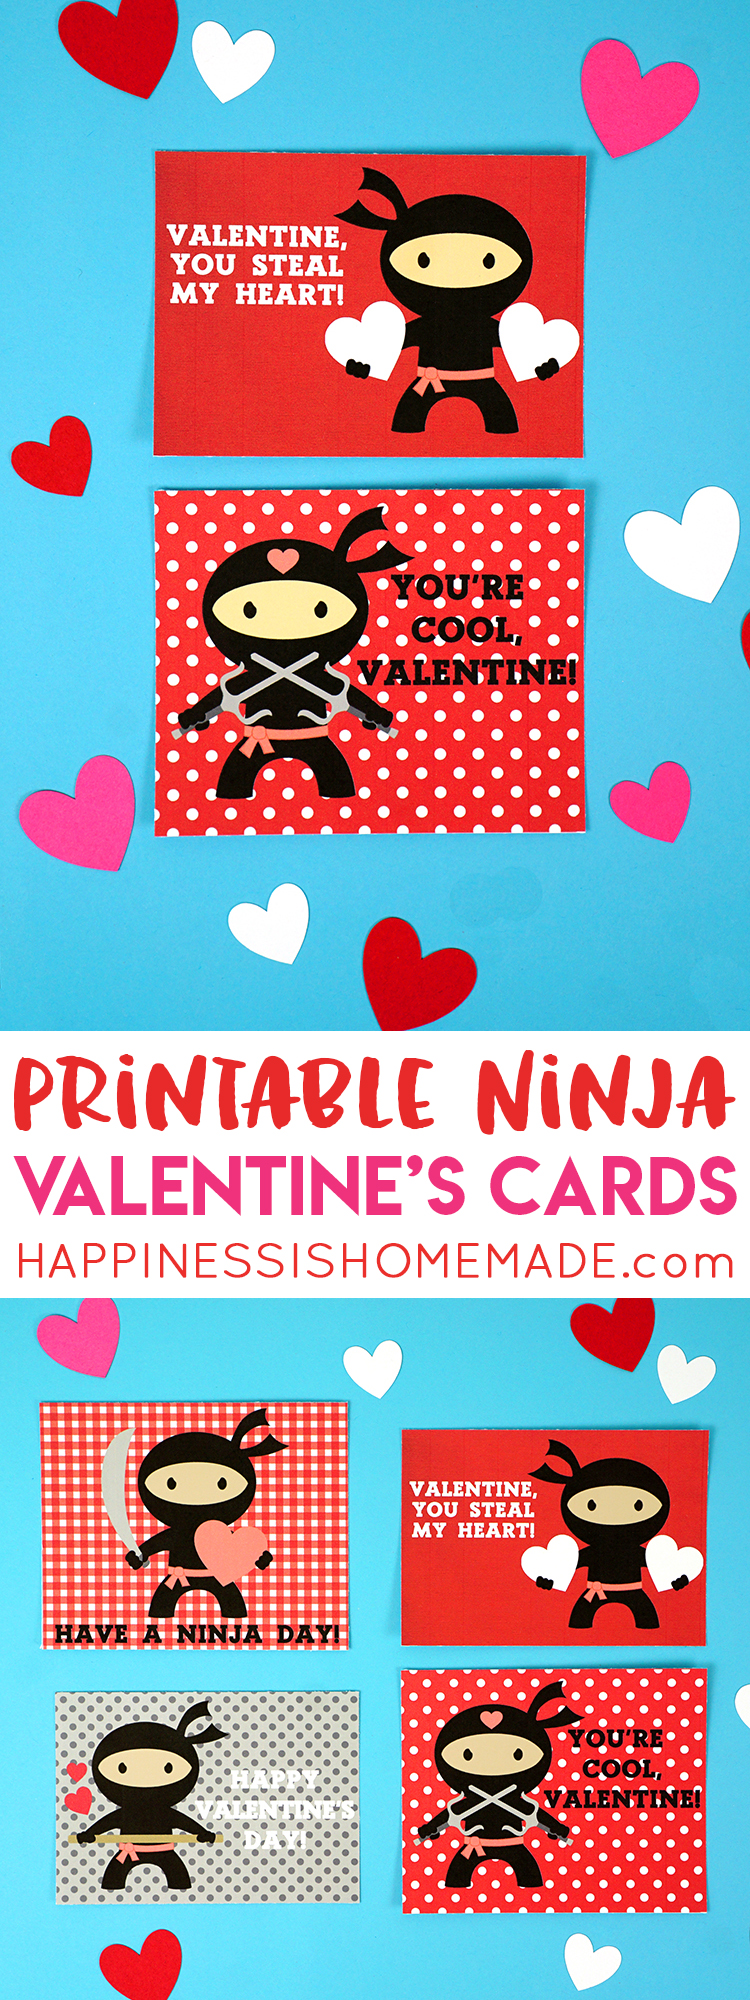 Ninja Printable Valentines Cards - Happiness is Homemade